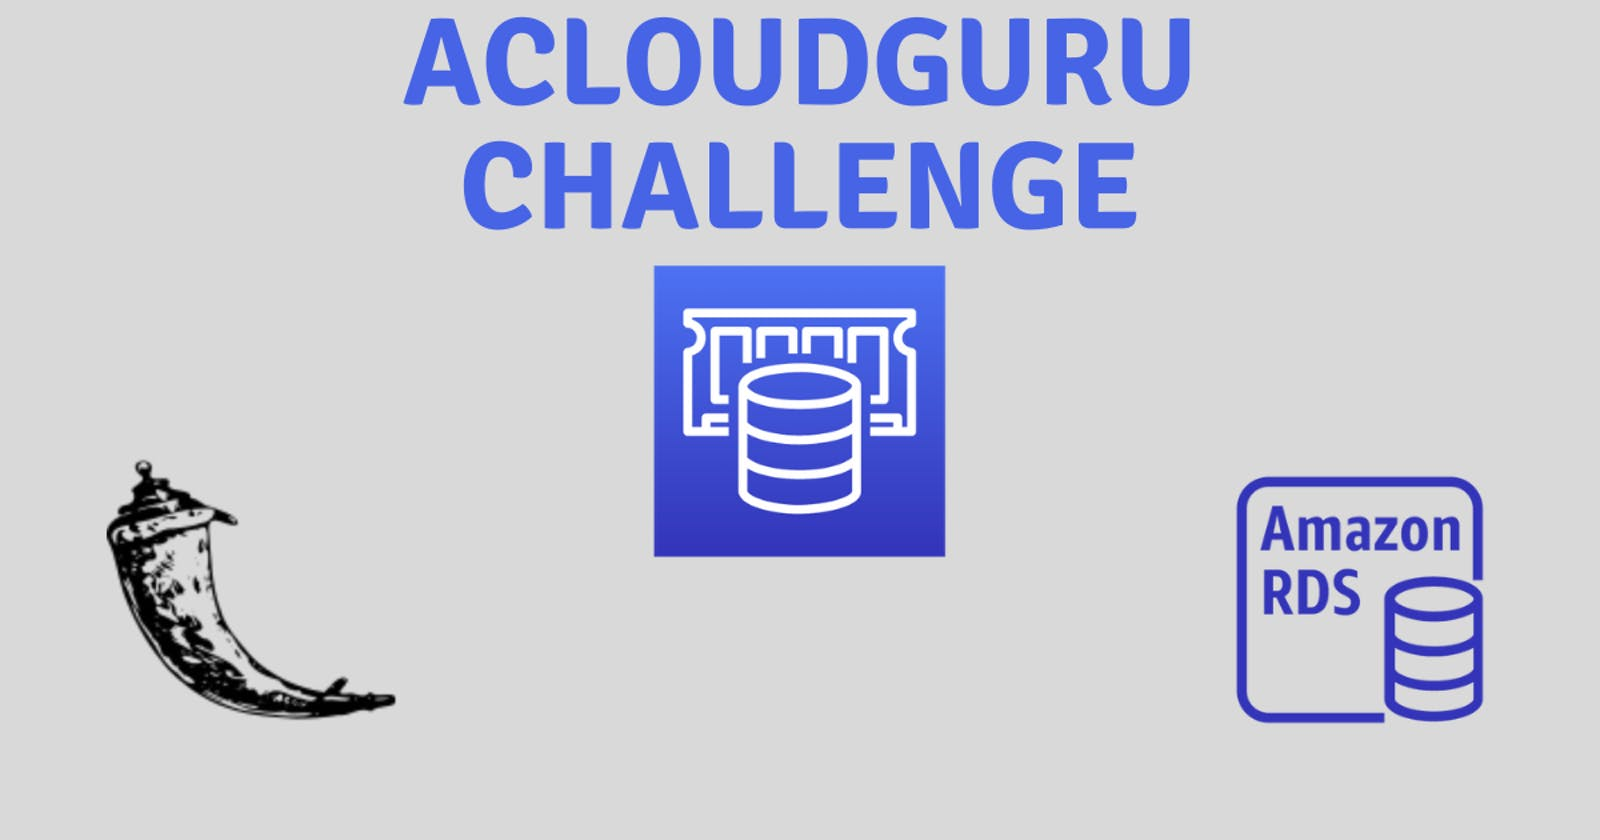 #ACloudGuru AWS ElastiCache Challenge